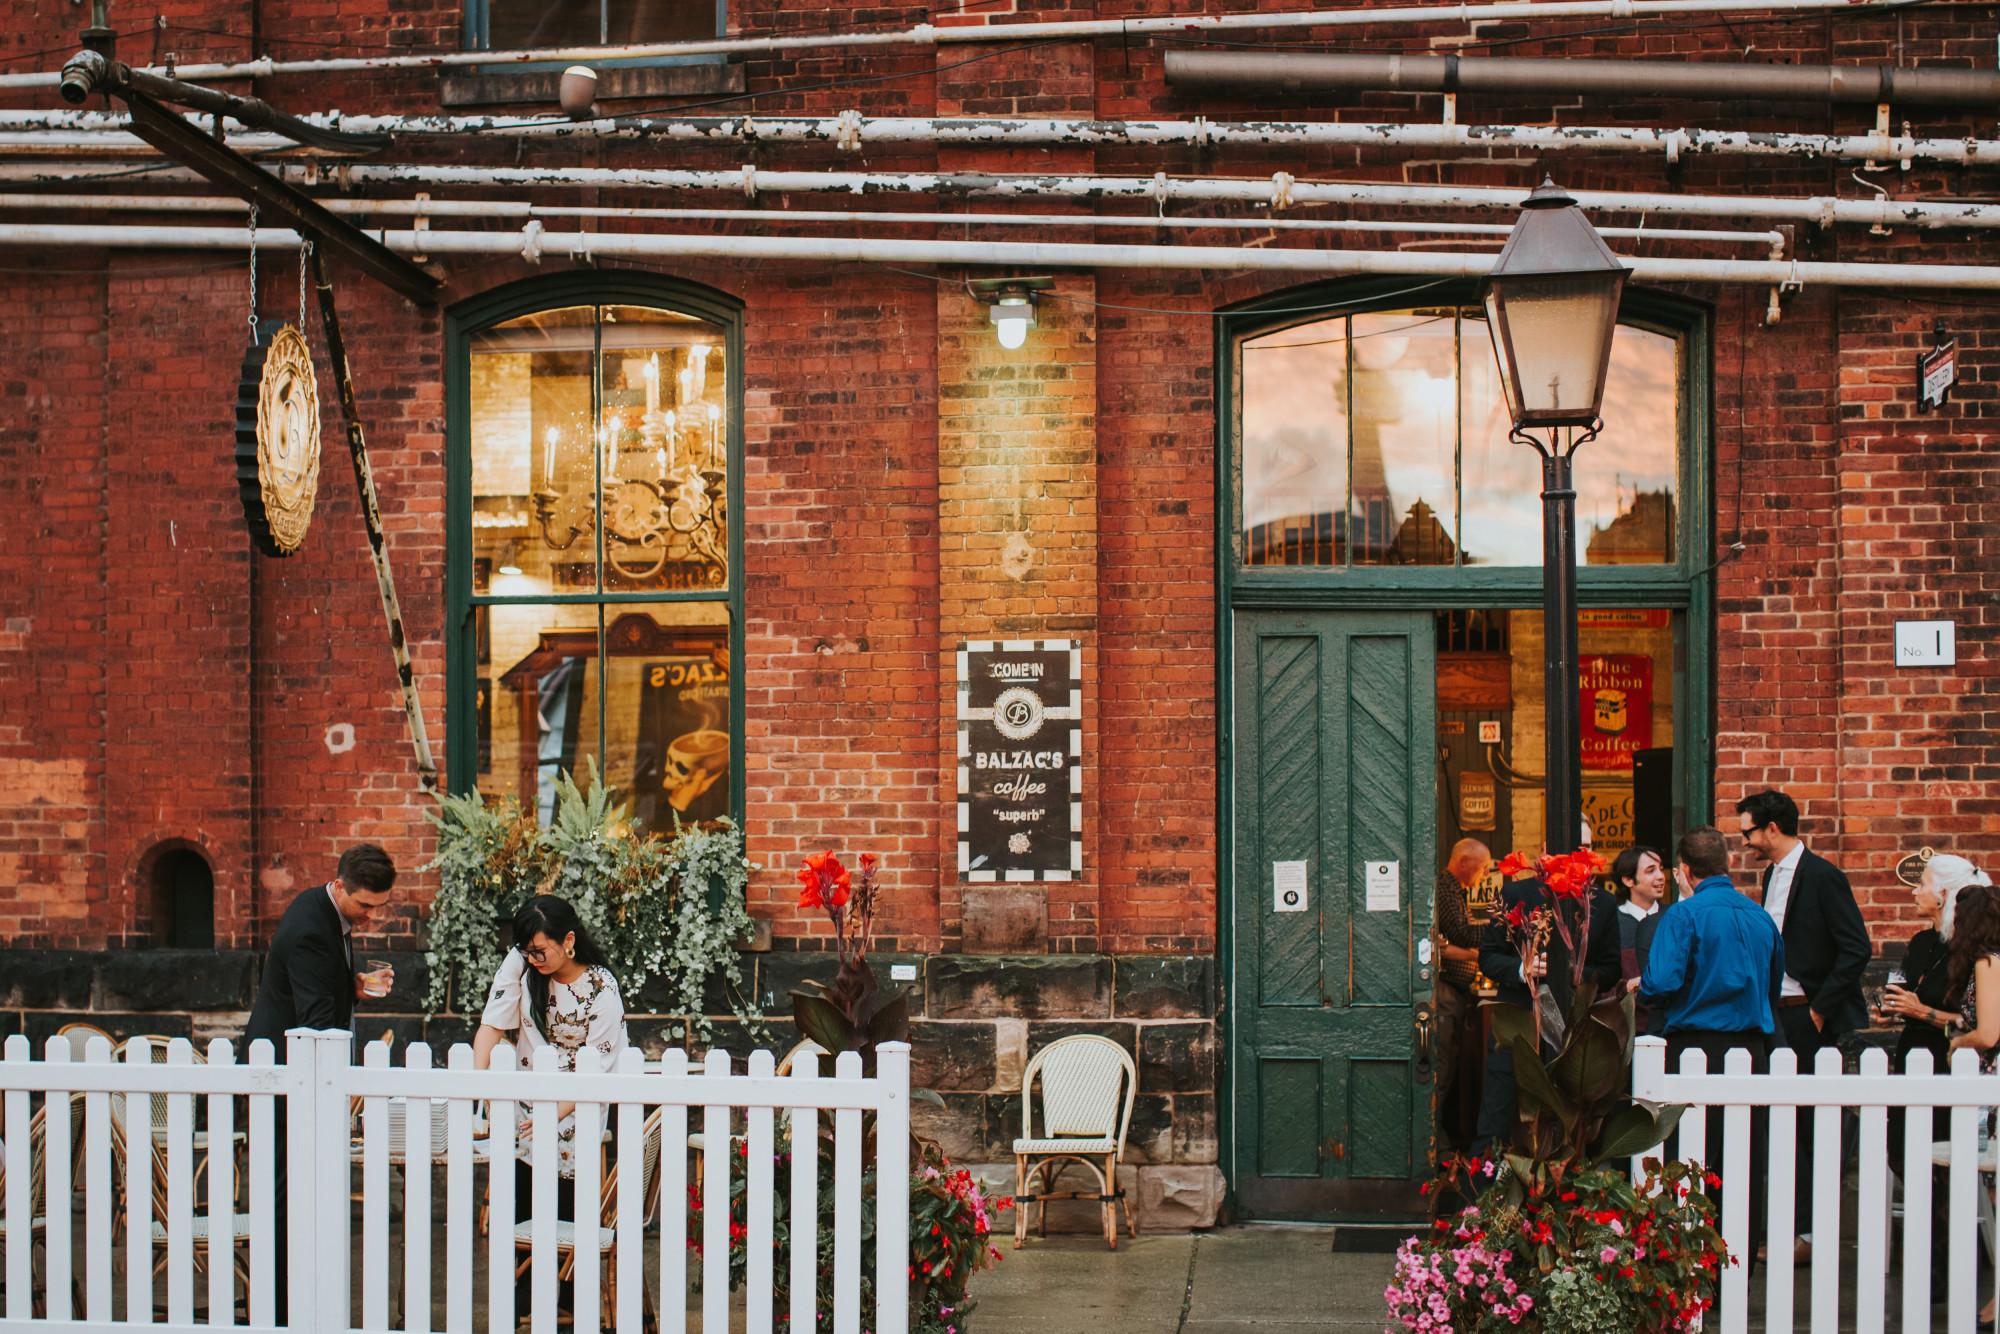 Beth-Ted-Balzacs-Coffee-Distillery-District-Toronto-Wedding-Planning-INLY-Events-Lushana-Bale-Photography-0225.jpg